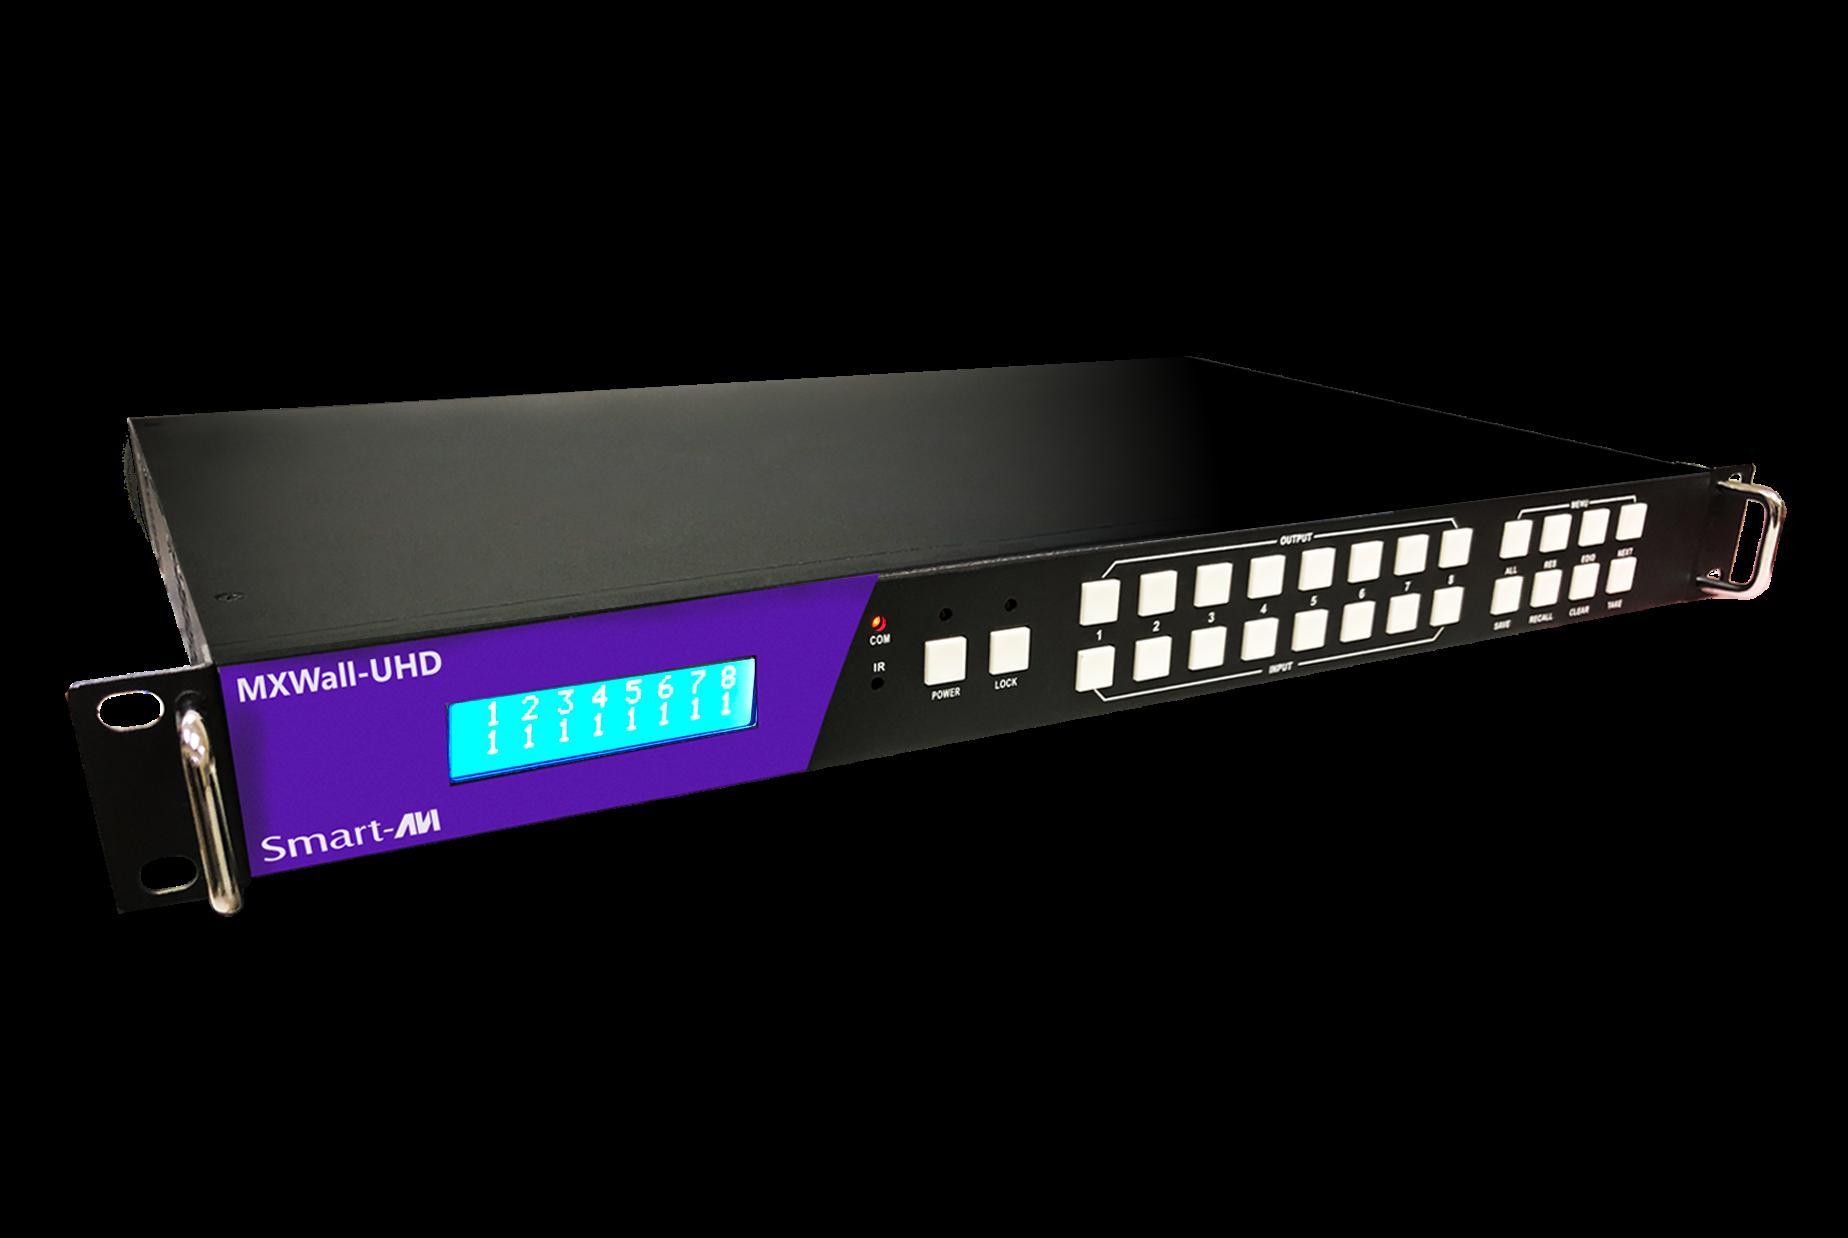 MXWall-UHD - SmartAVI